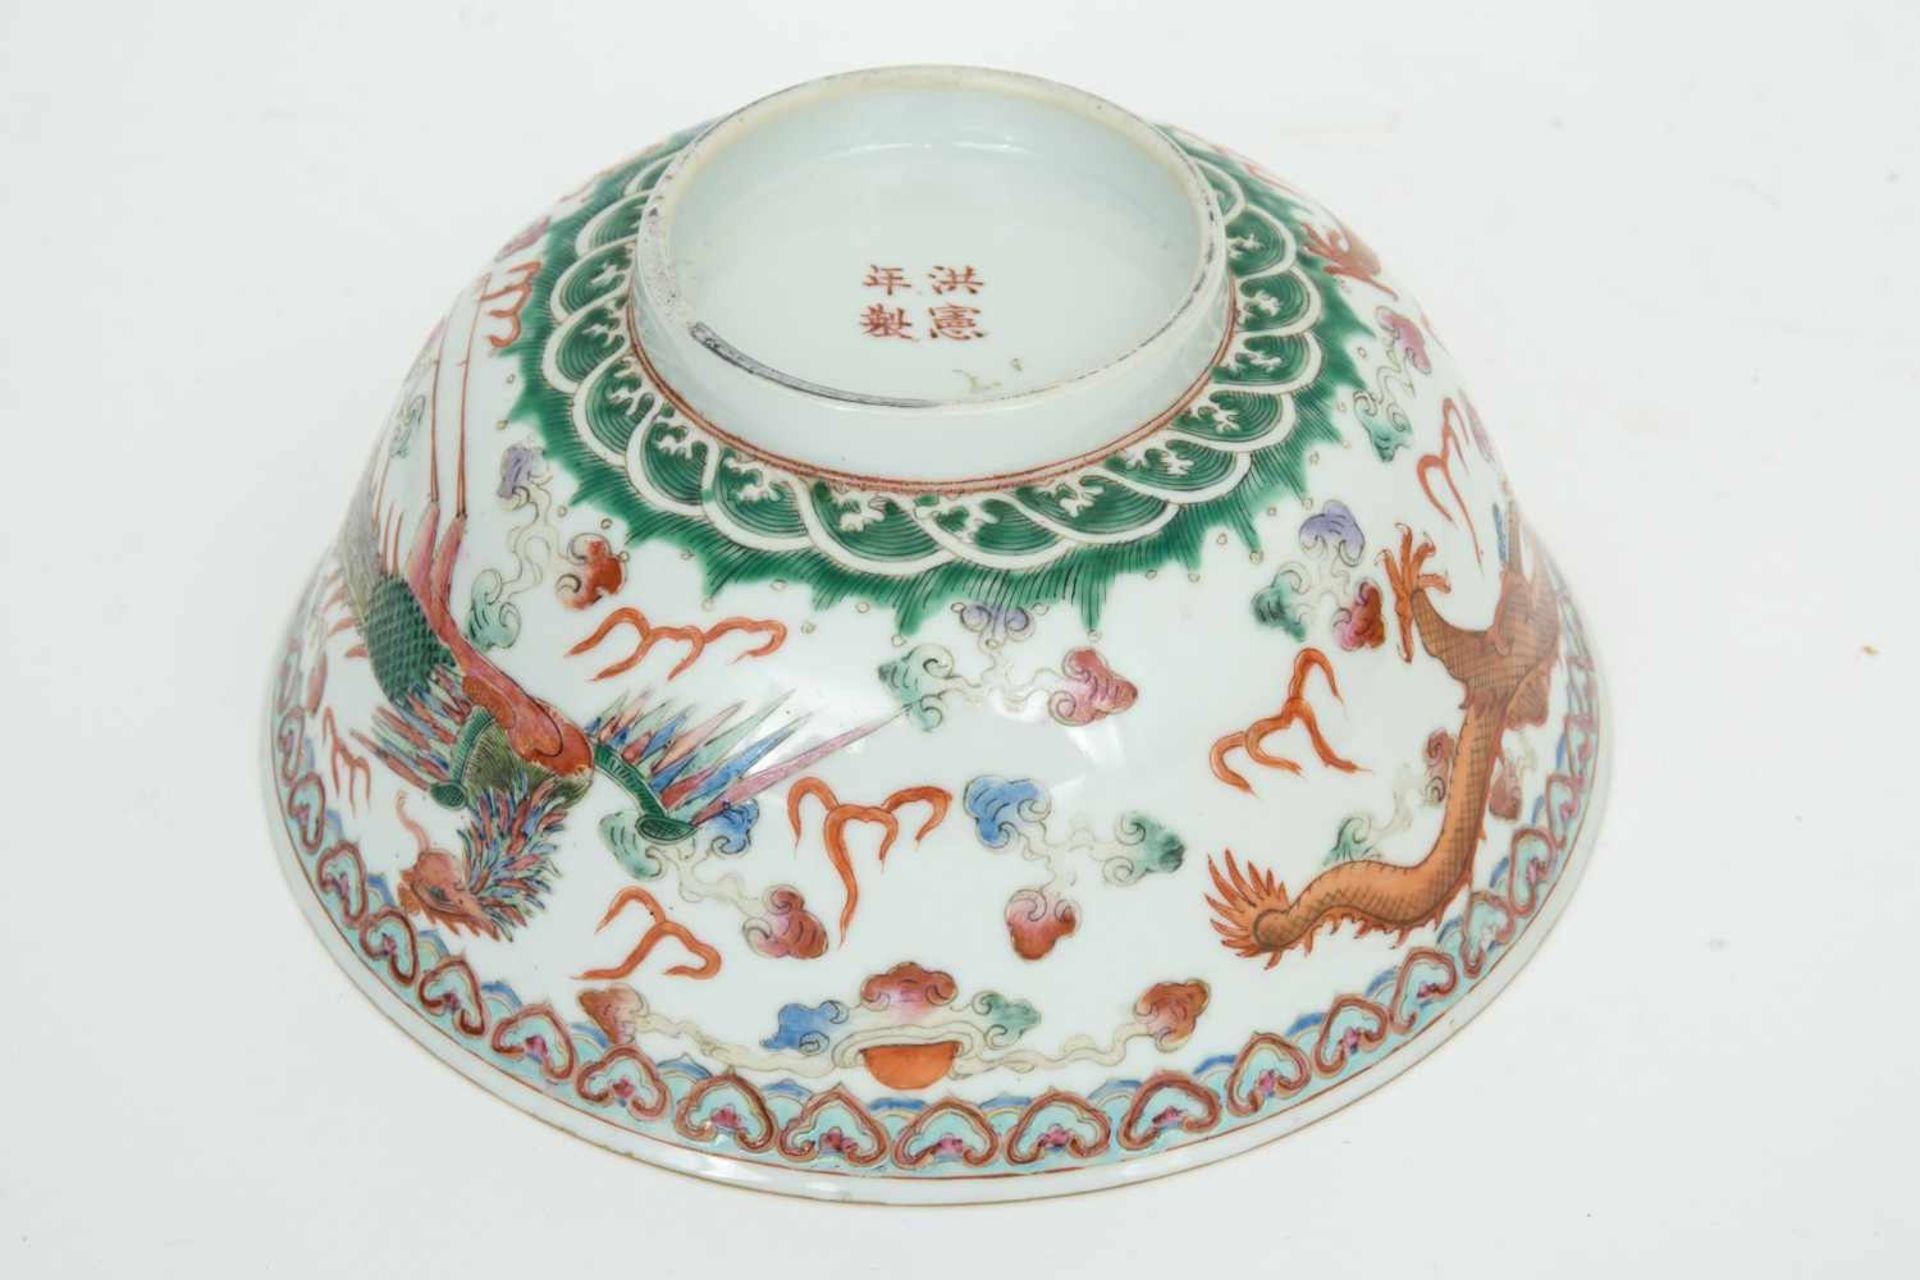 Los 39 - PORZELLANSCHÄLCHEN, Republic of China, Hongxian (1915-1916) Schälchen aus Porzellan,dekoriert mit